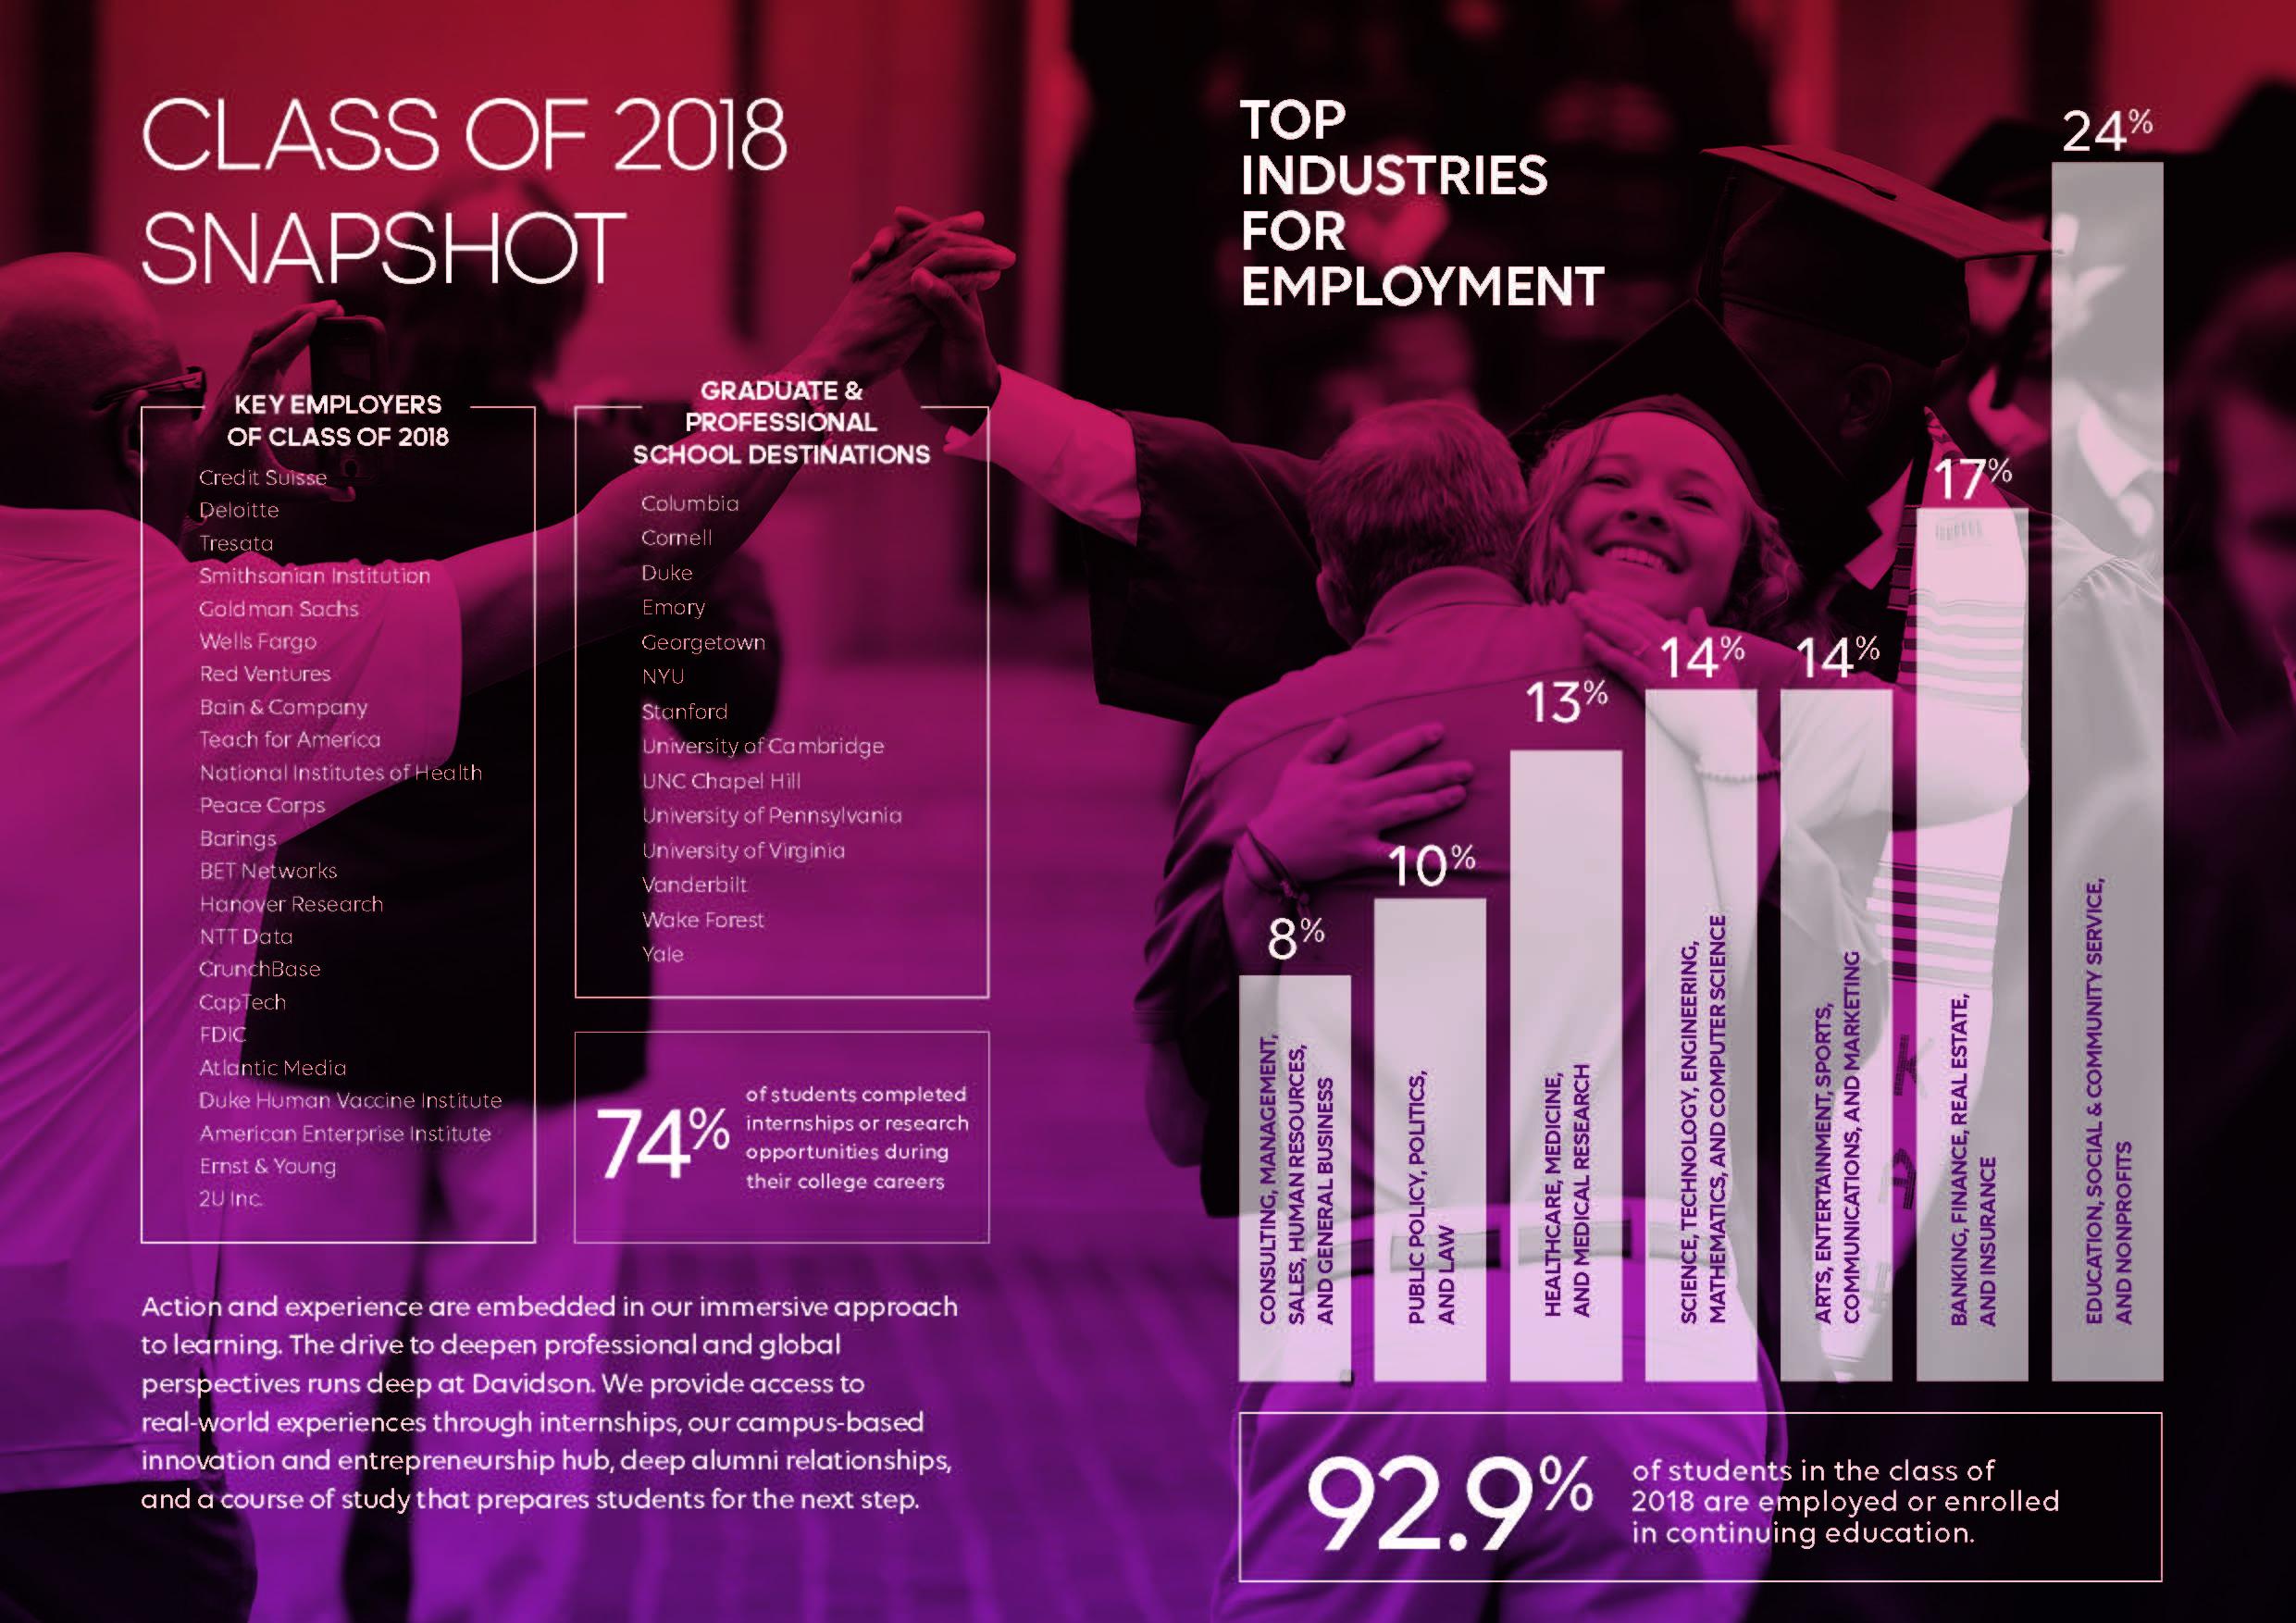 Viewbook: Class of 2018 Snapshot